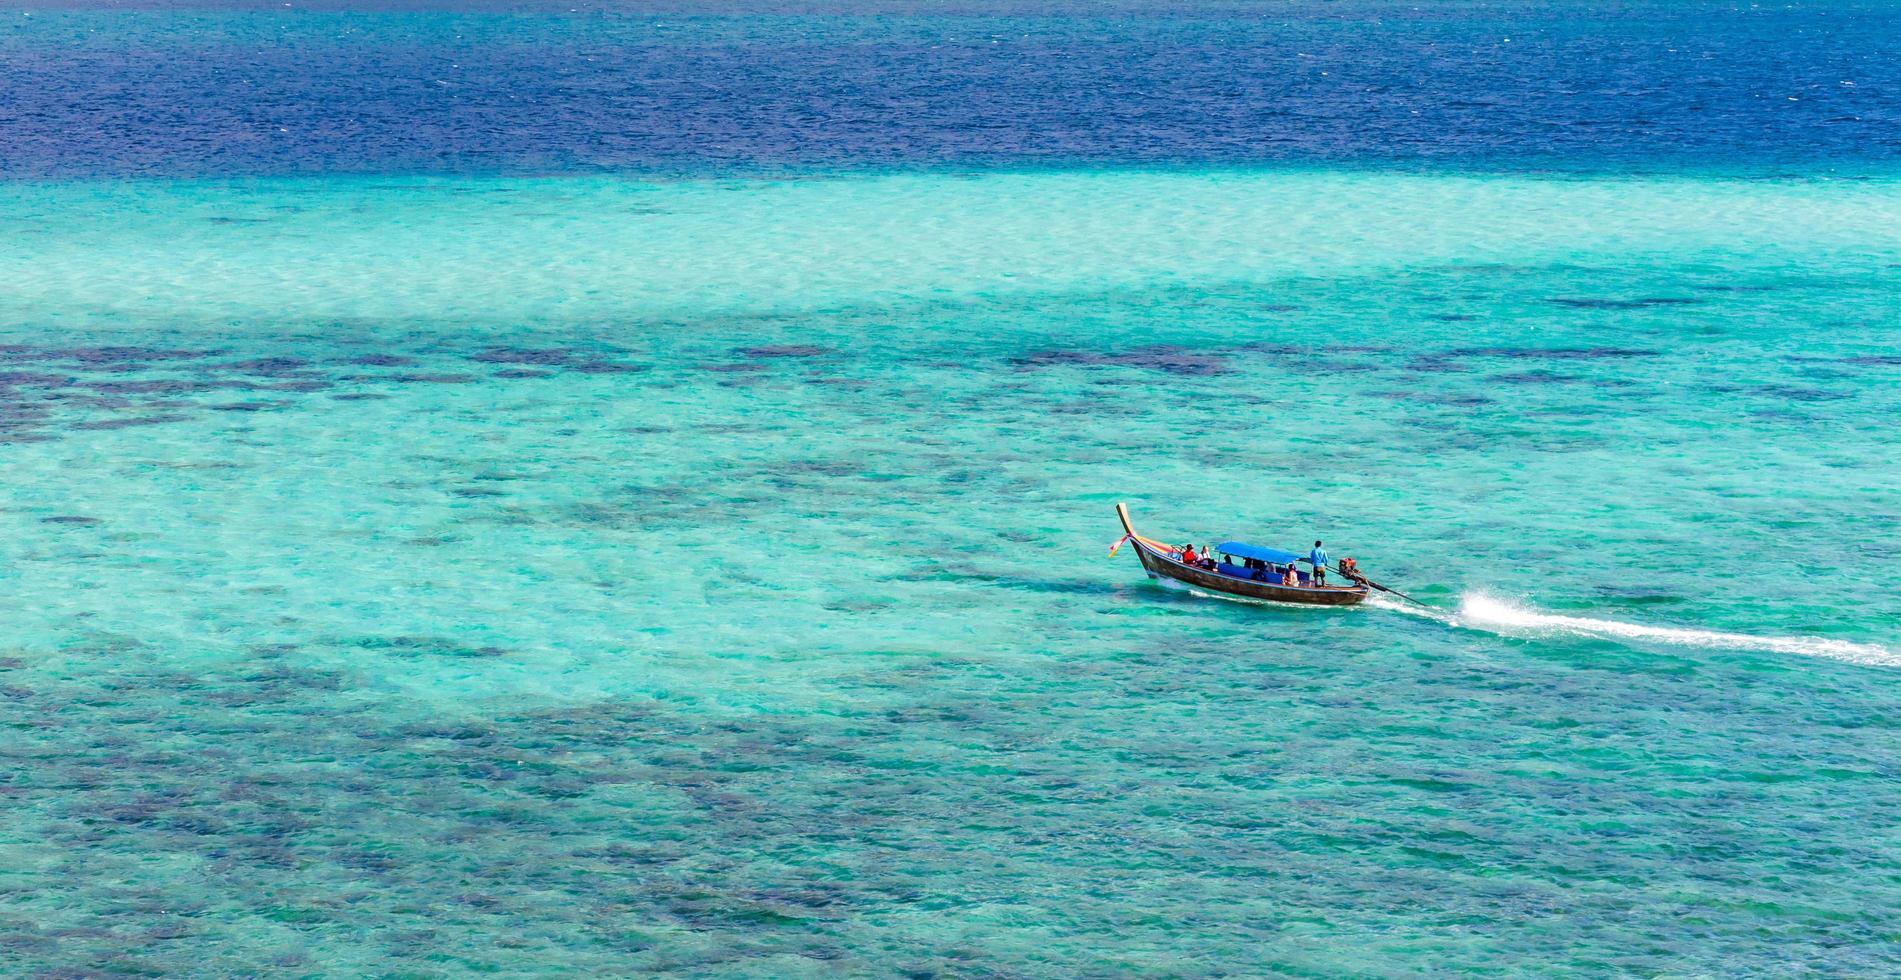 boten op de zee, li-pe thailand. foto